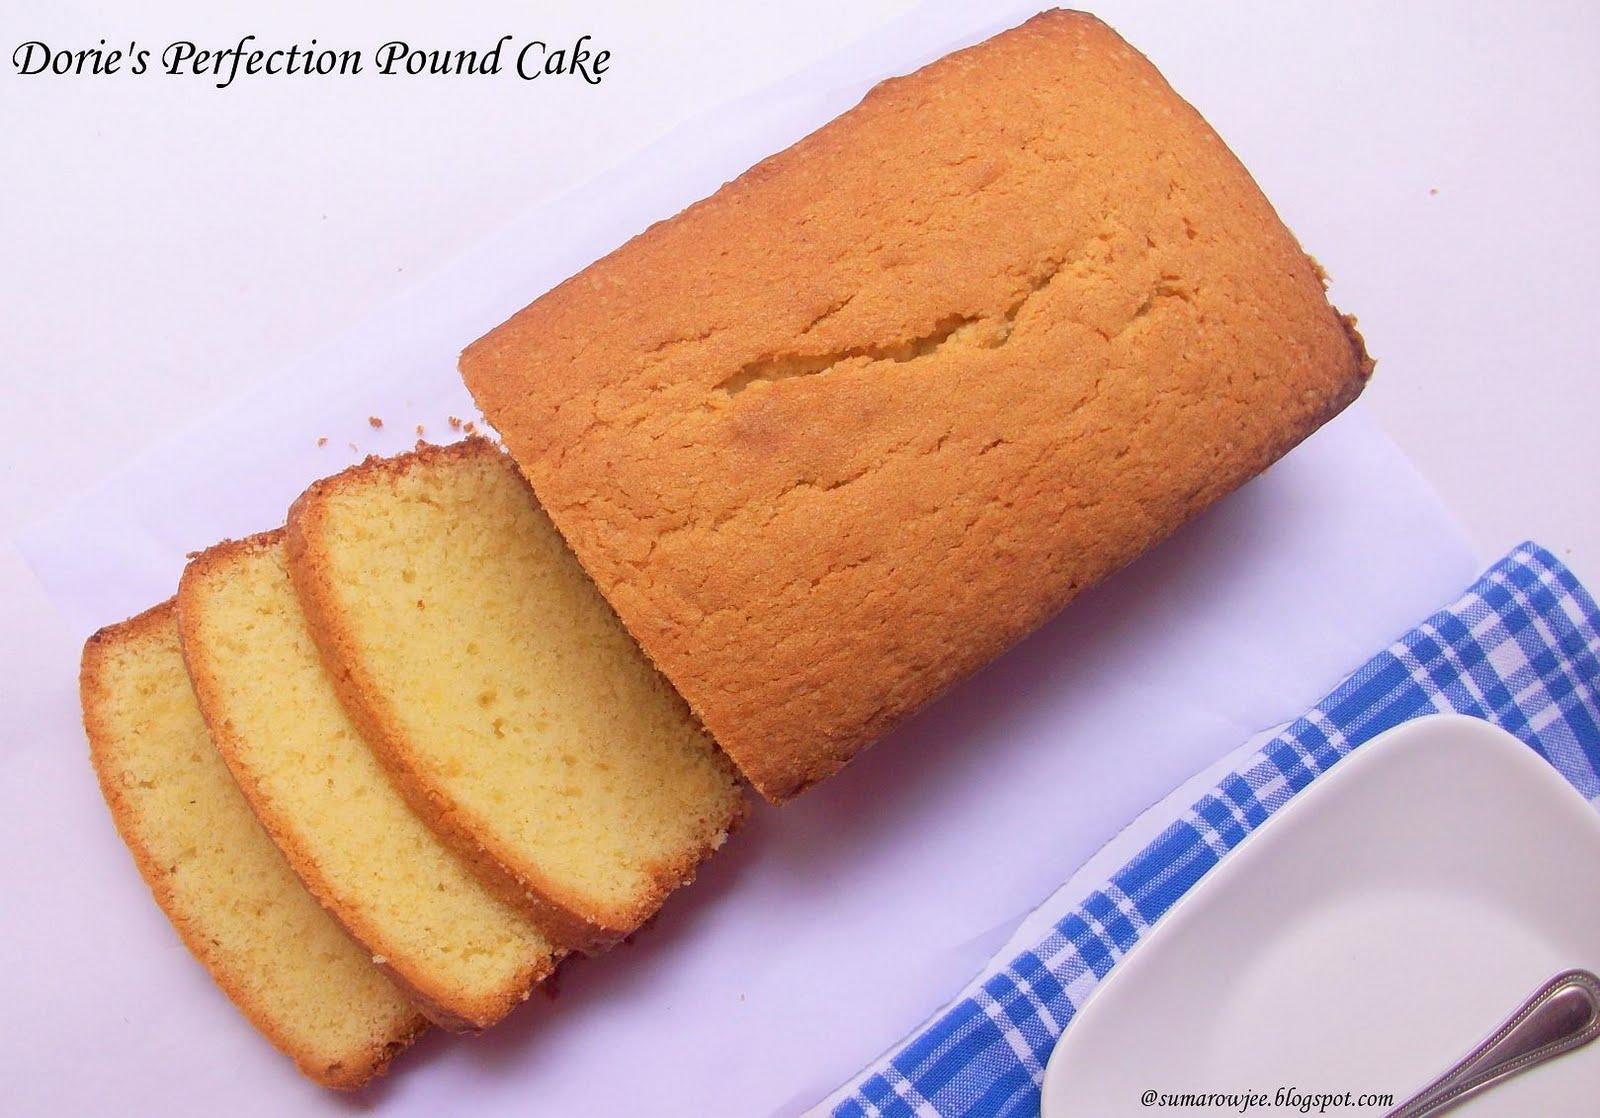 Dorie Greenspan Cake Recipe